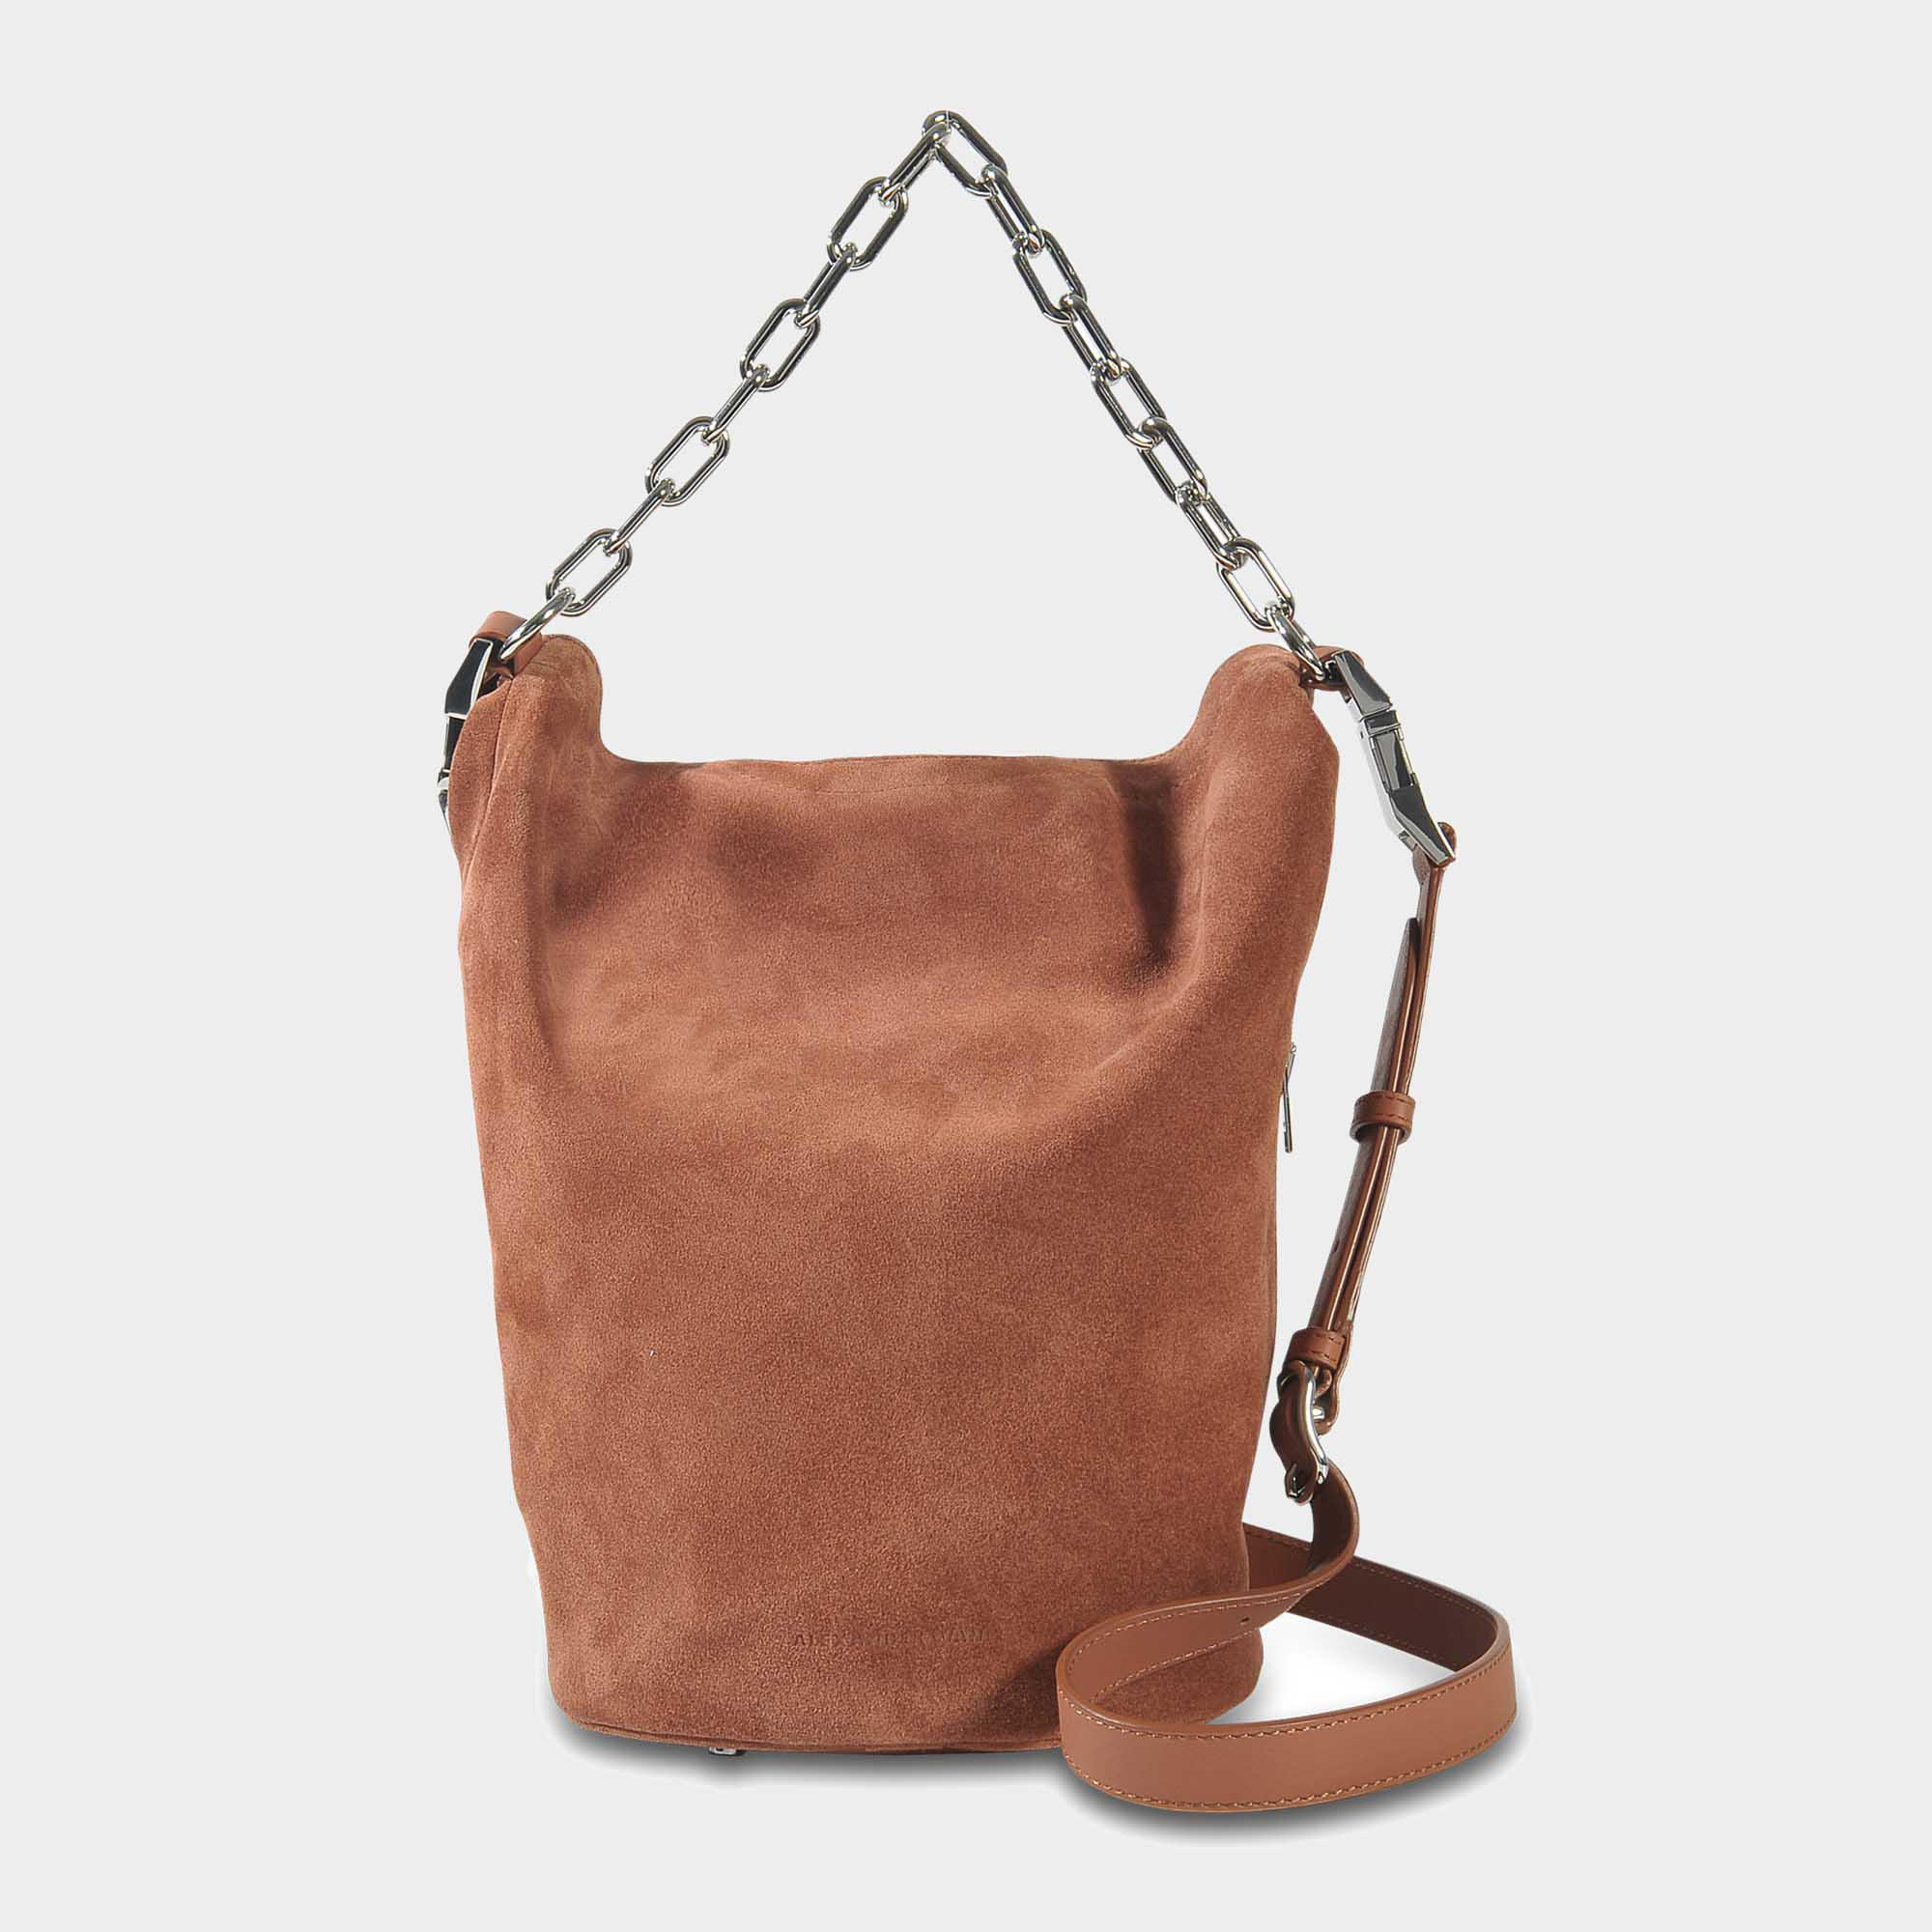 Attica Soft Dry Sack Bag in Terracotta Calfskin Alexander Wang lnN0P71